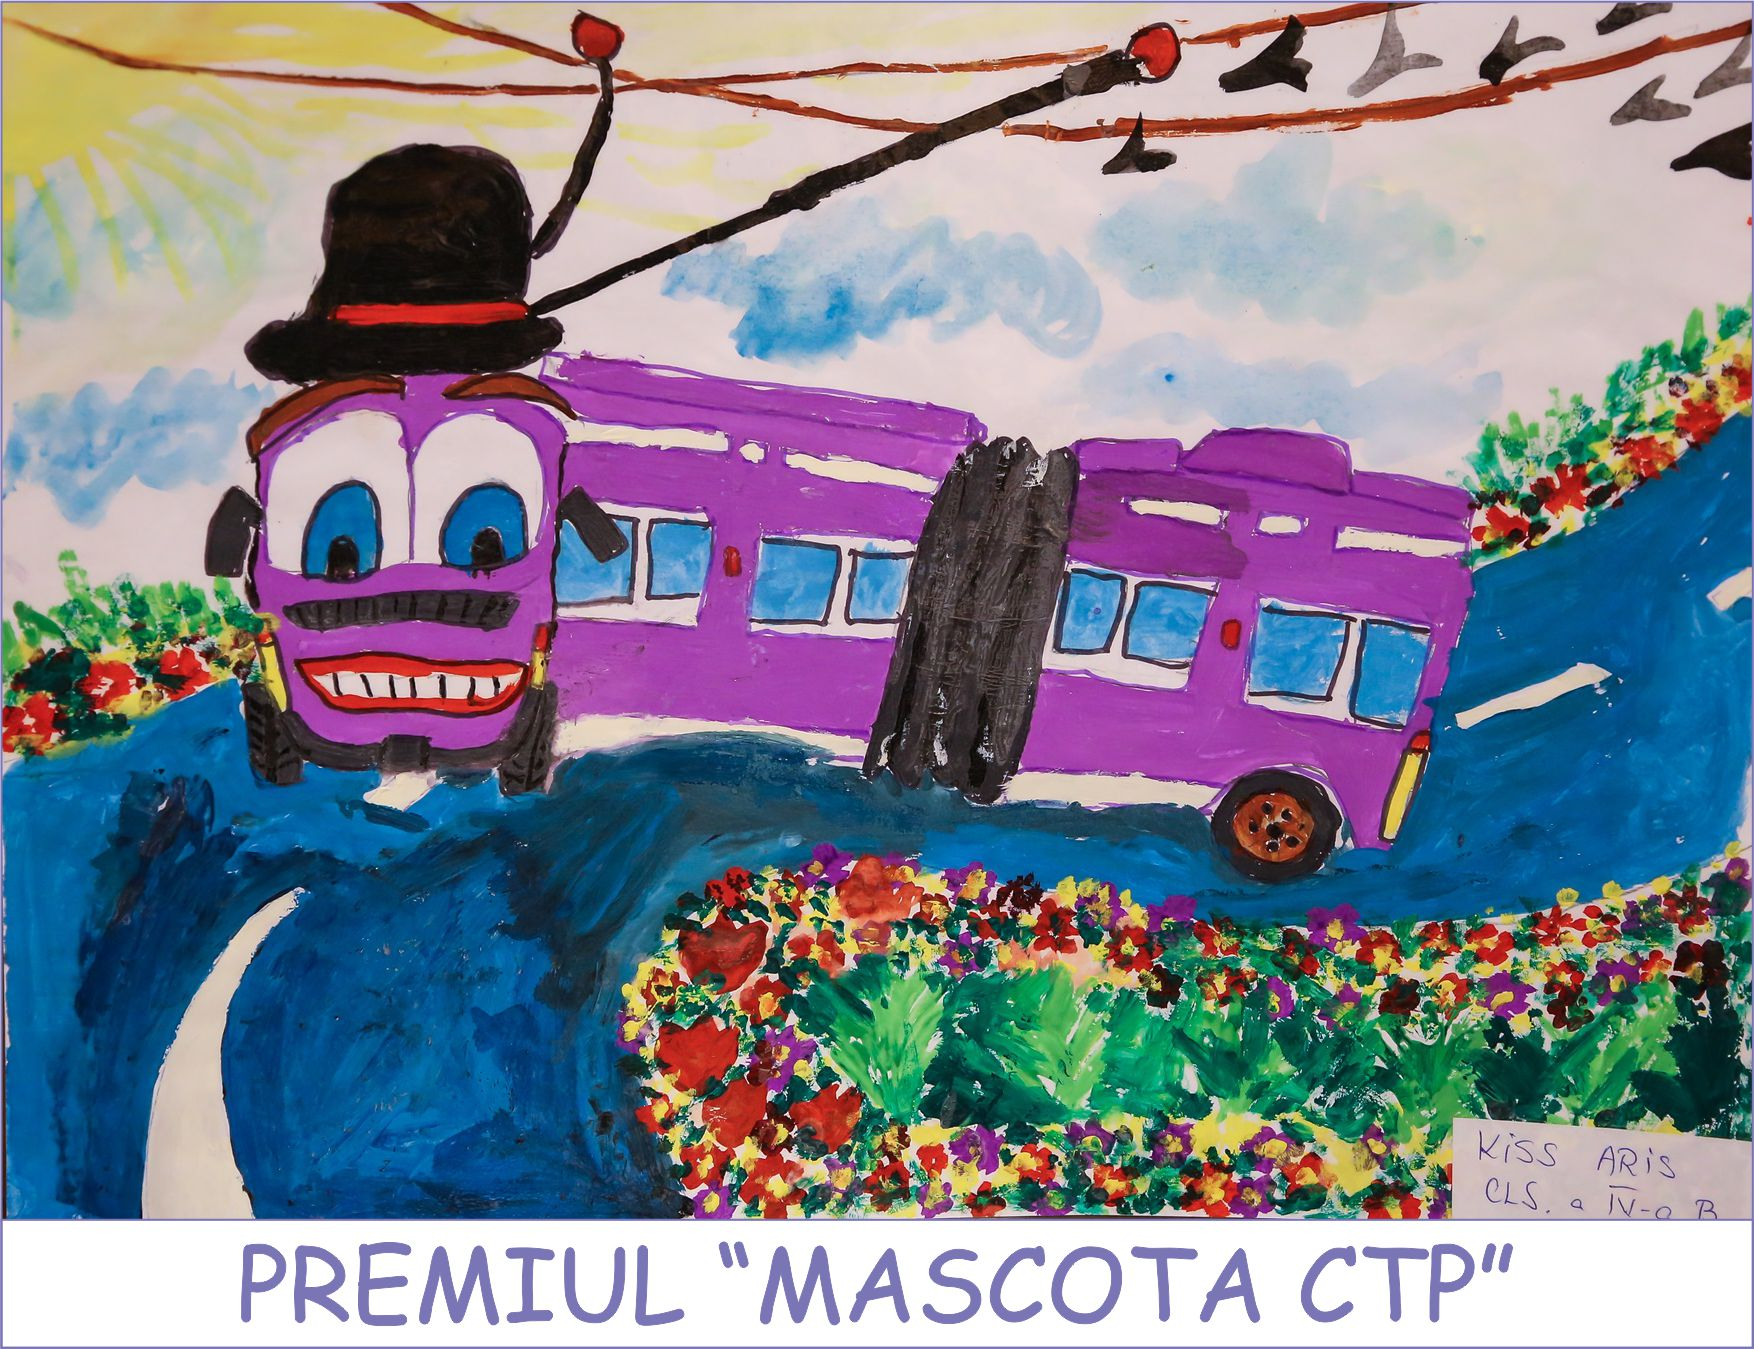 PREMIUL MASCOTA CTP